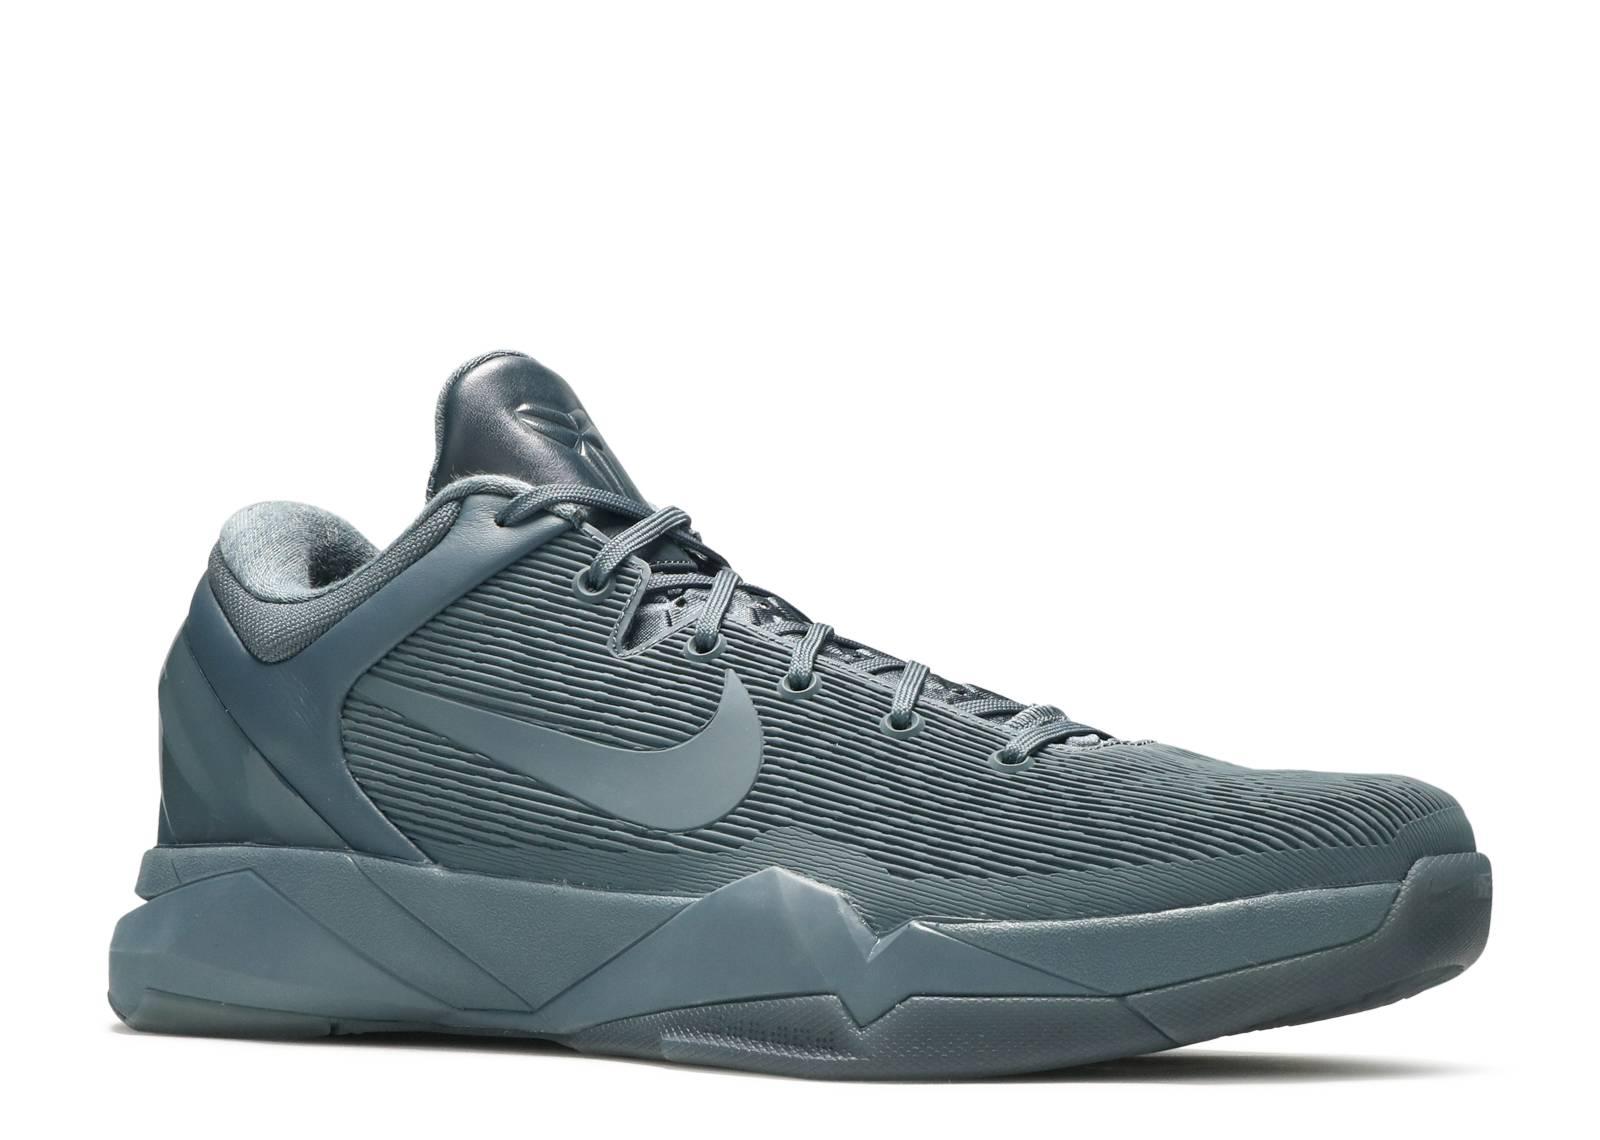 Blue Kobe Nike Shoes